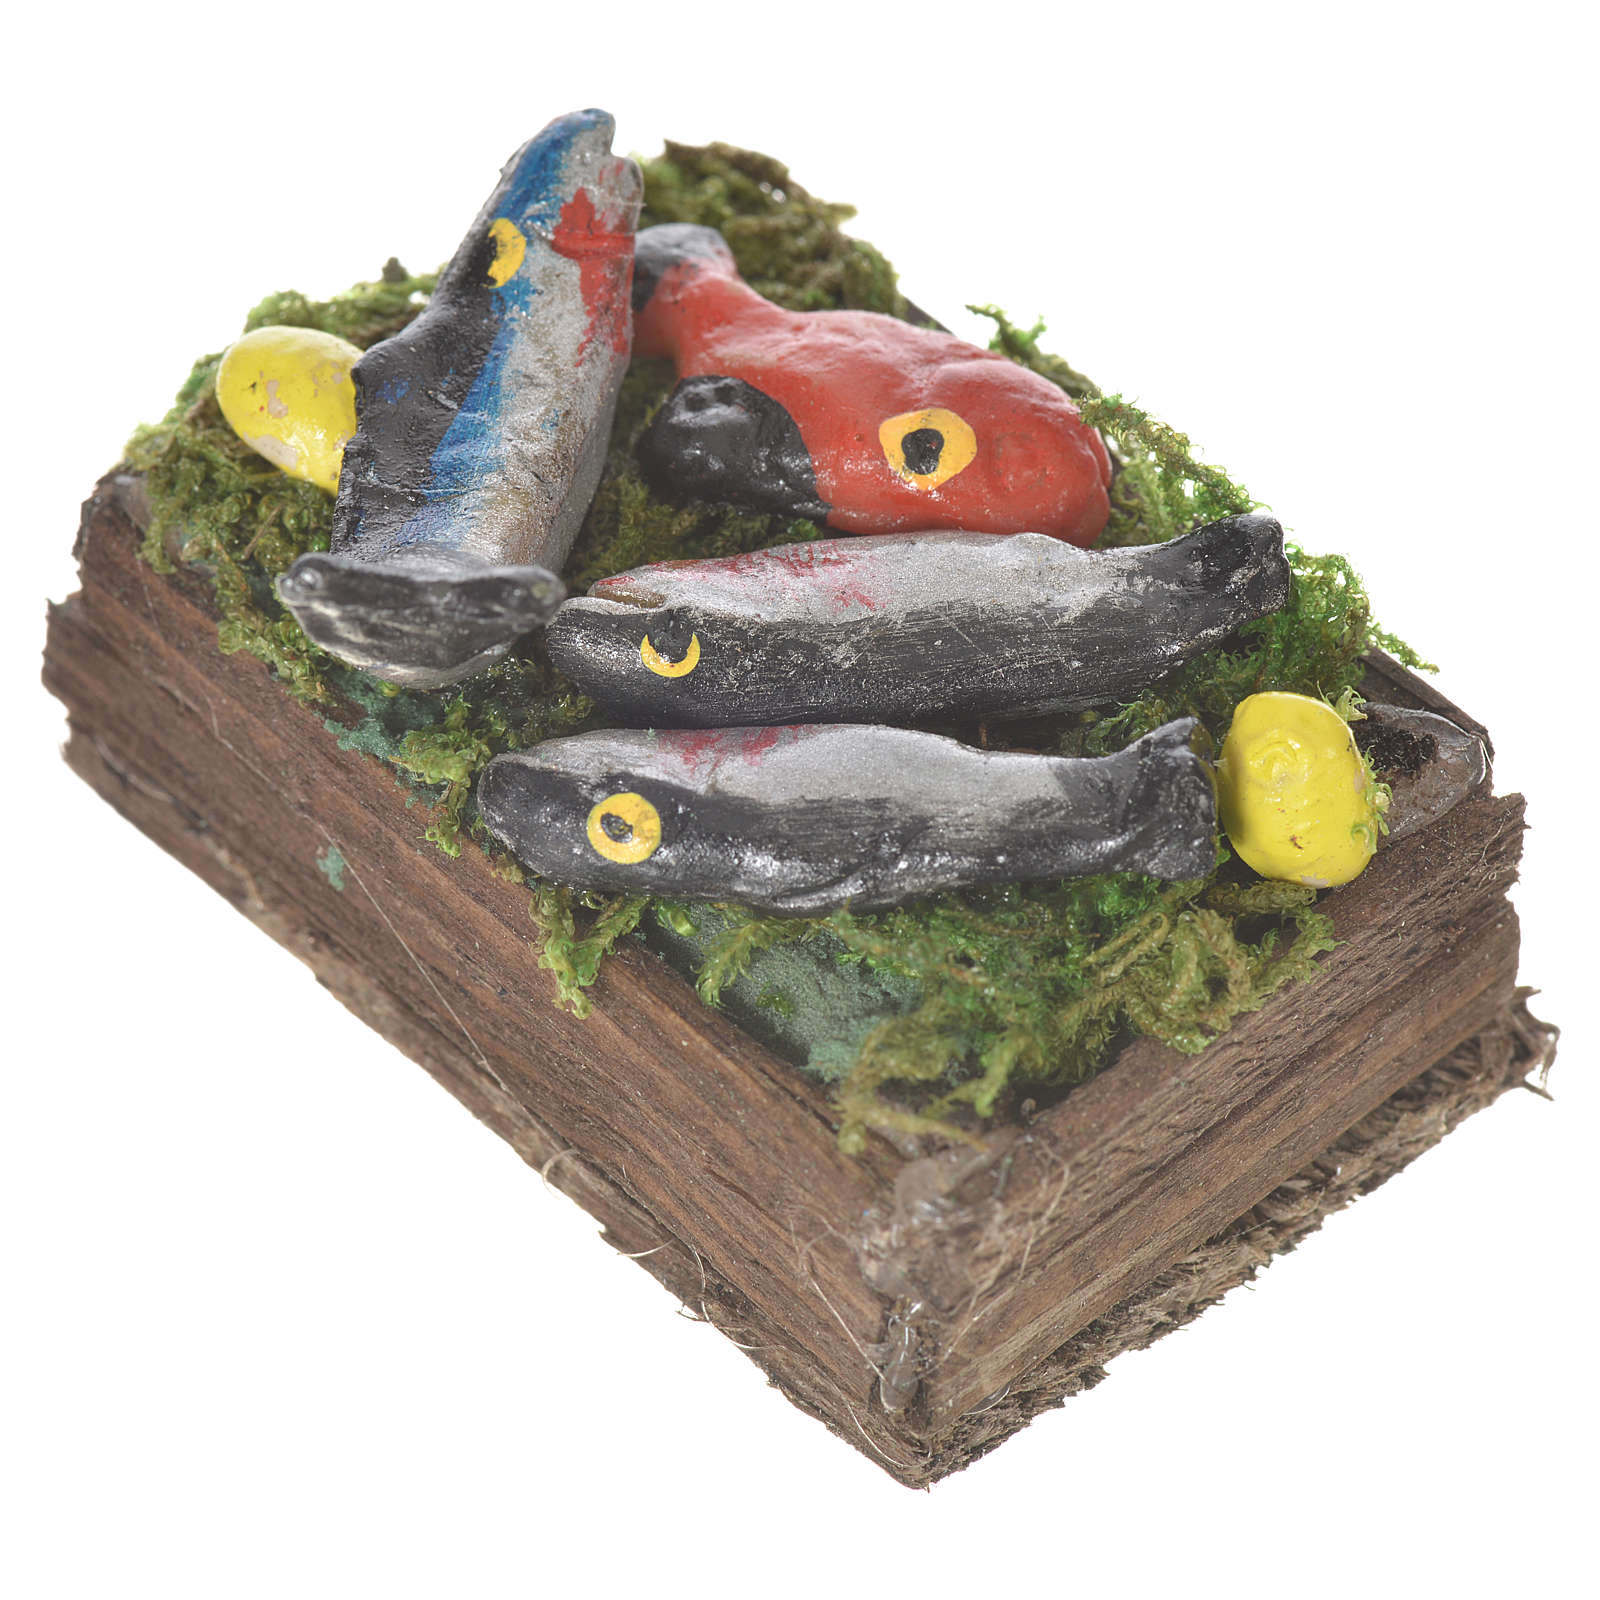 Wax fish box for 20-24cm nativities 4